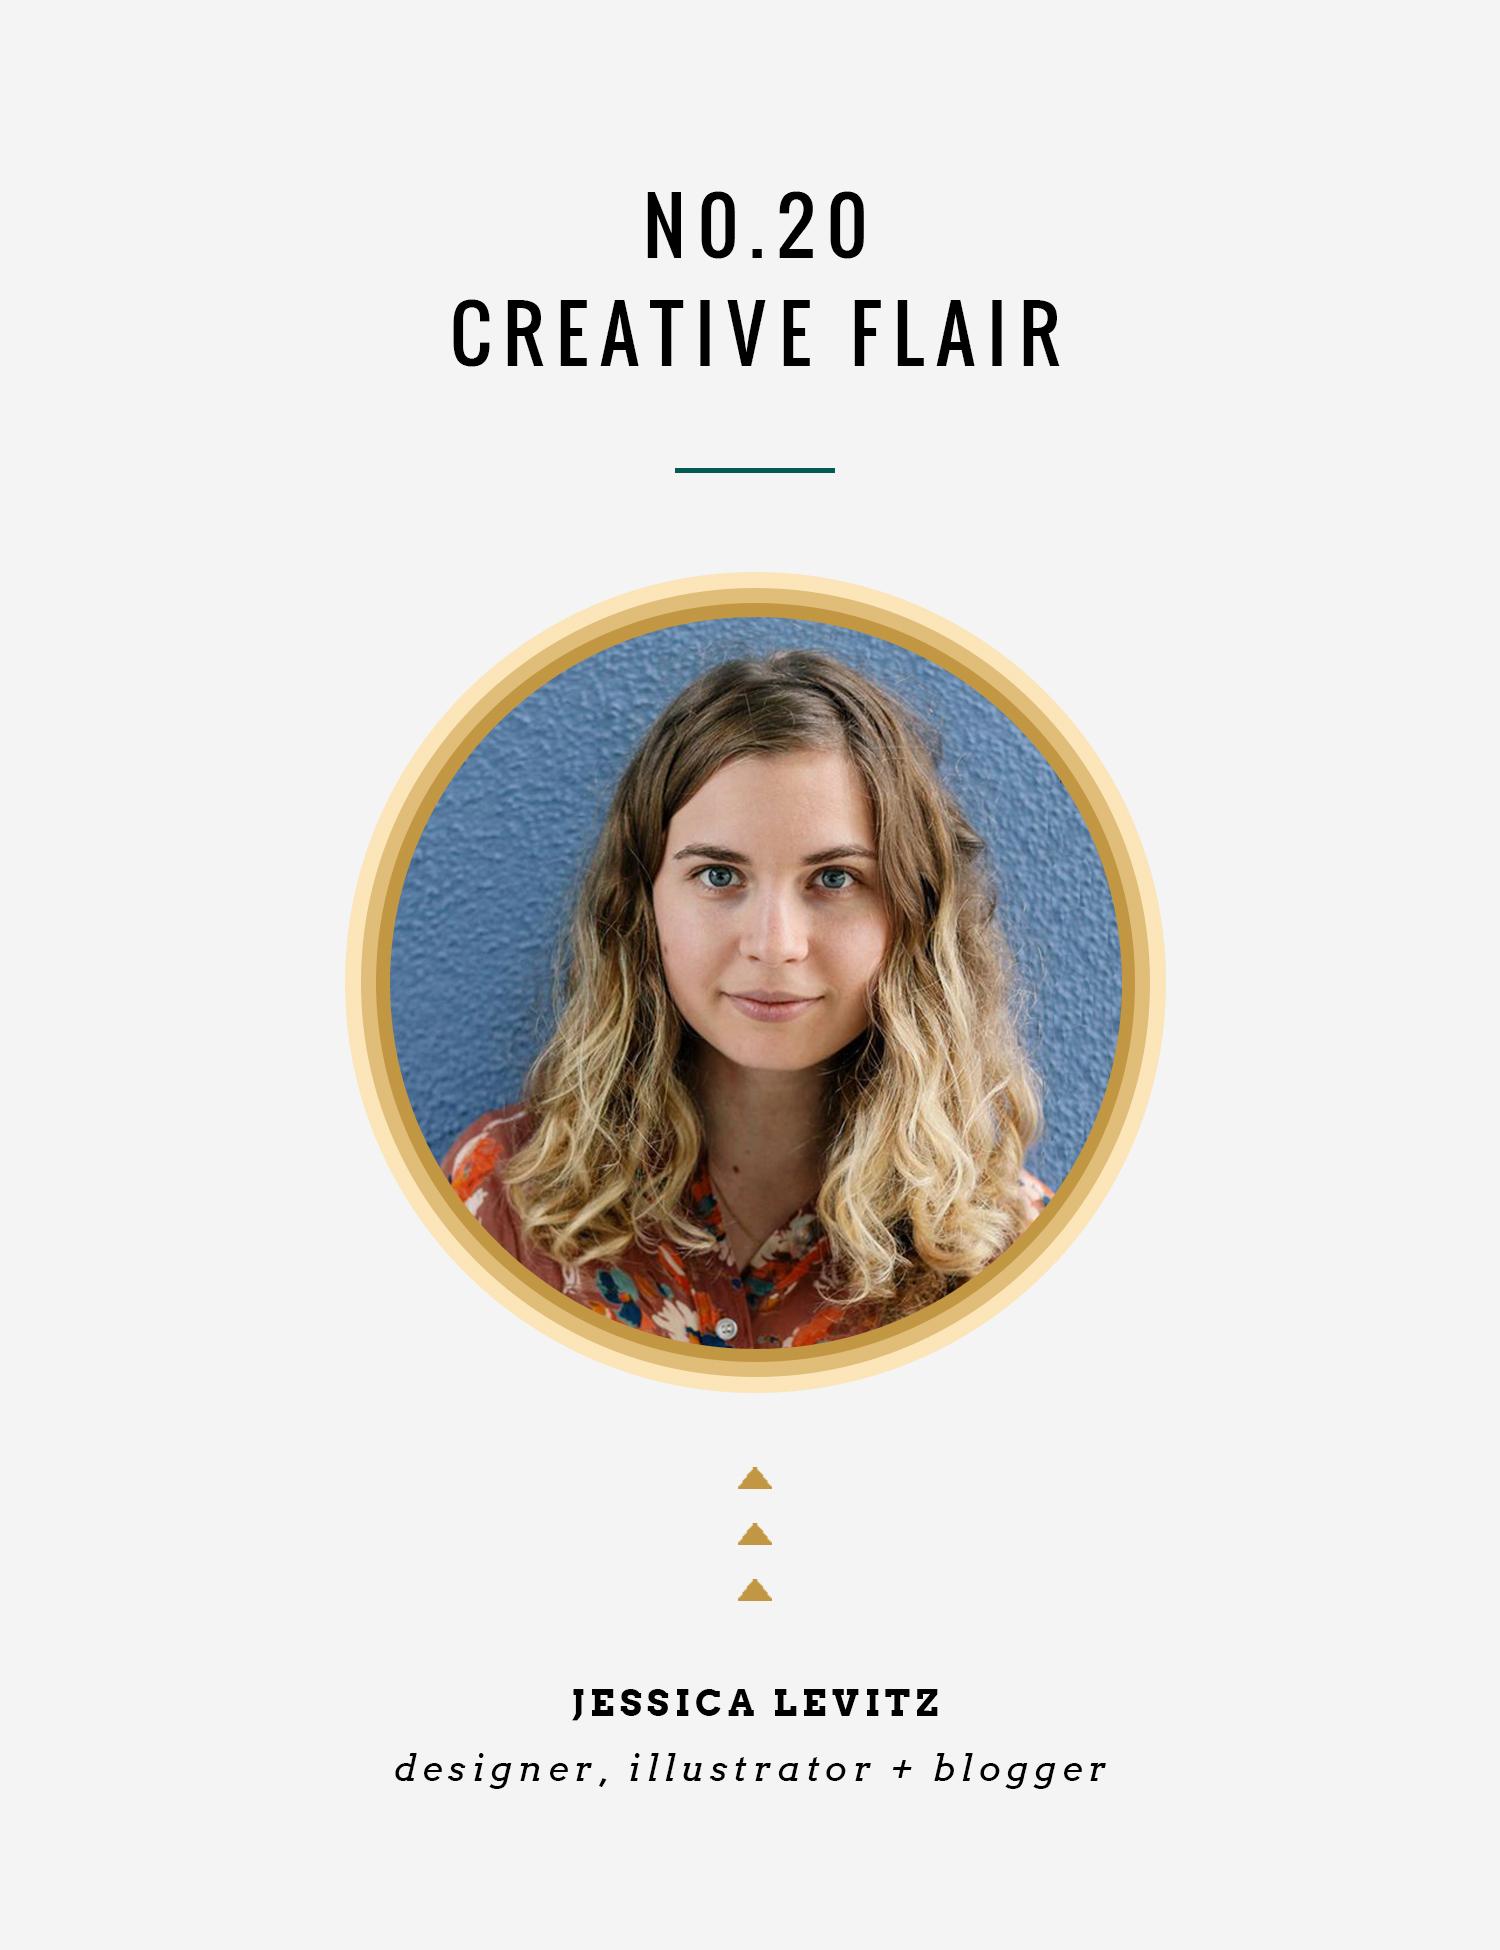 Creative Flair : Jessica Levitz | InBetween the Curls